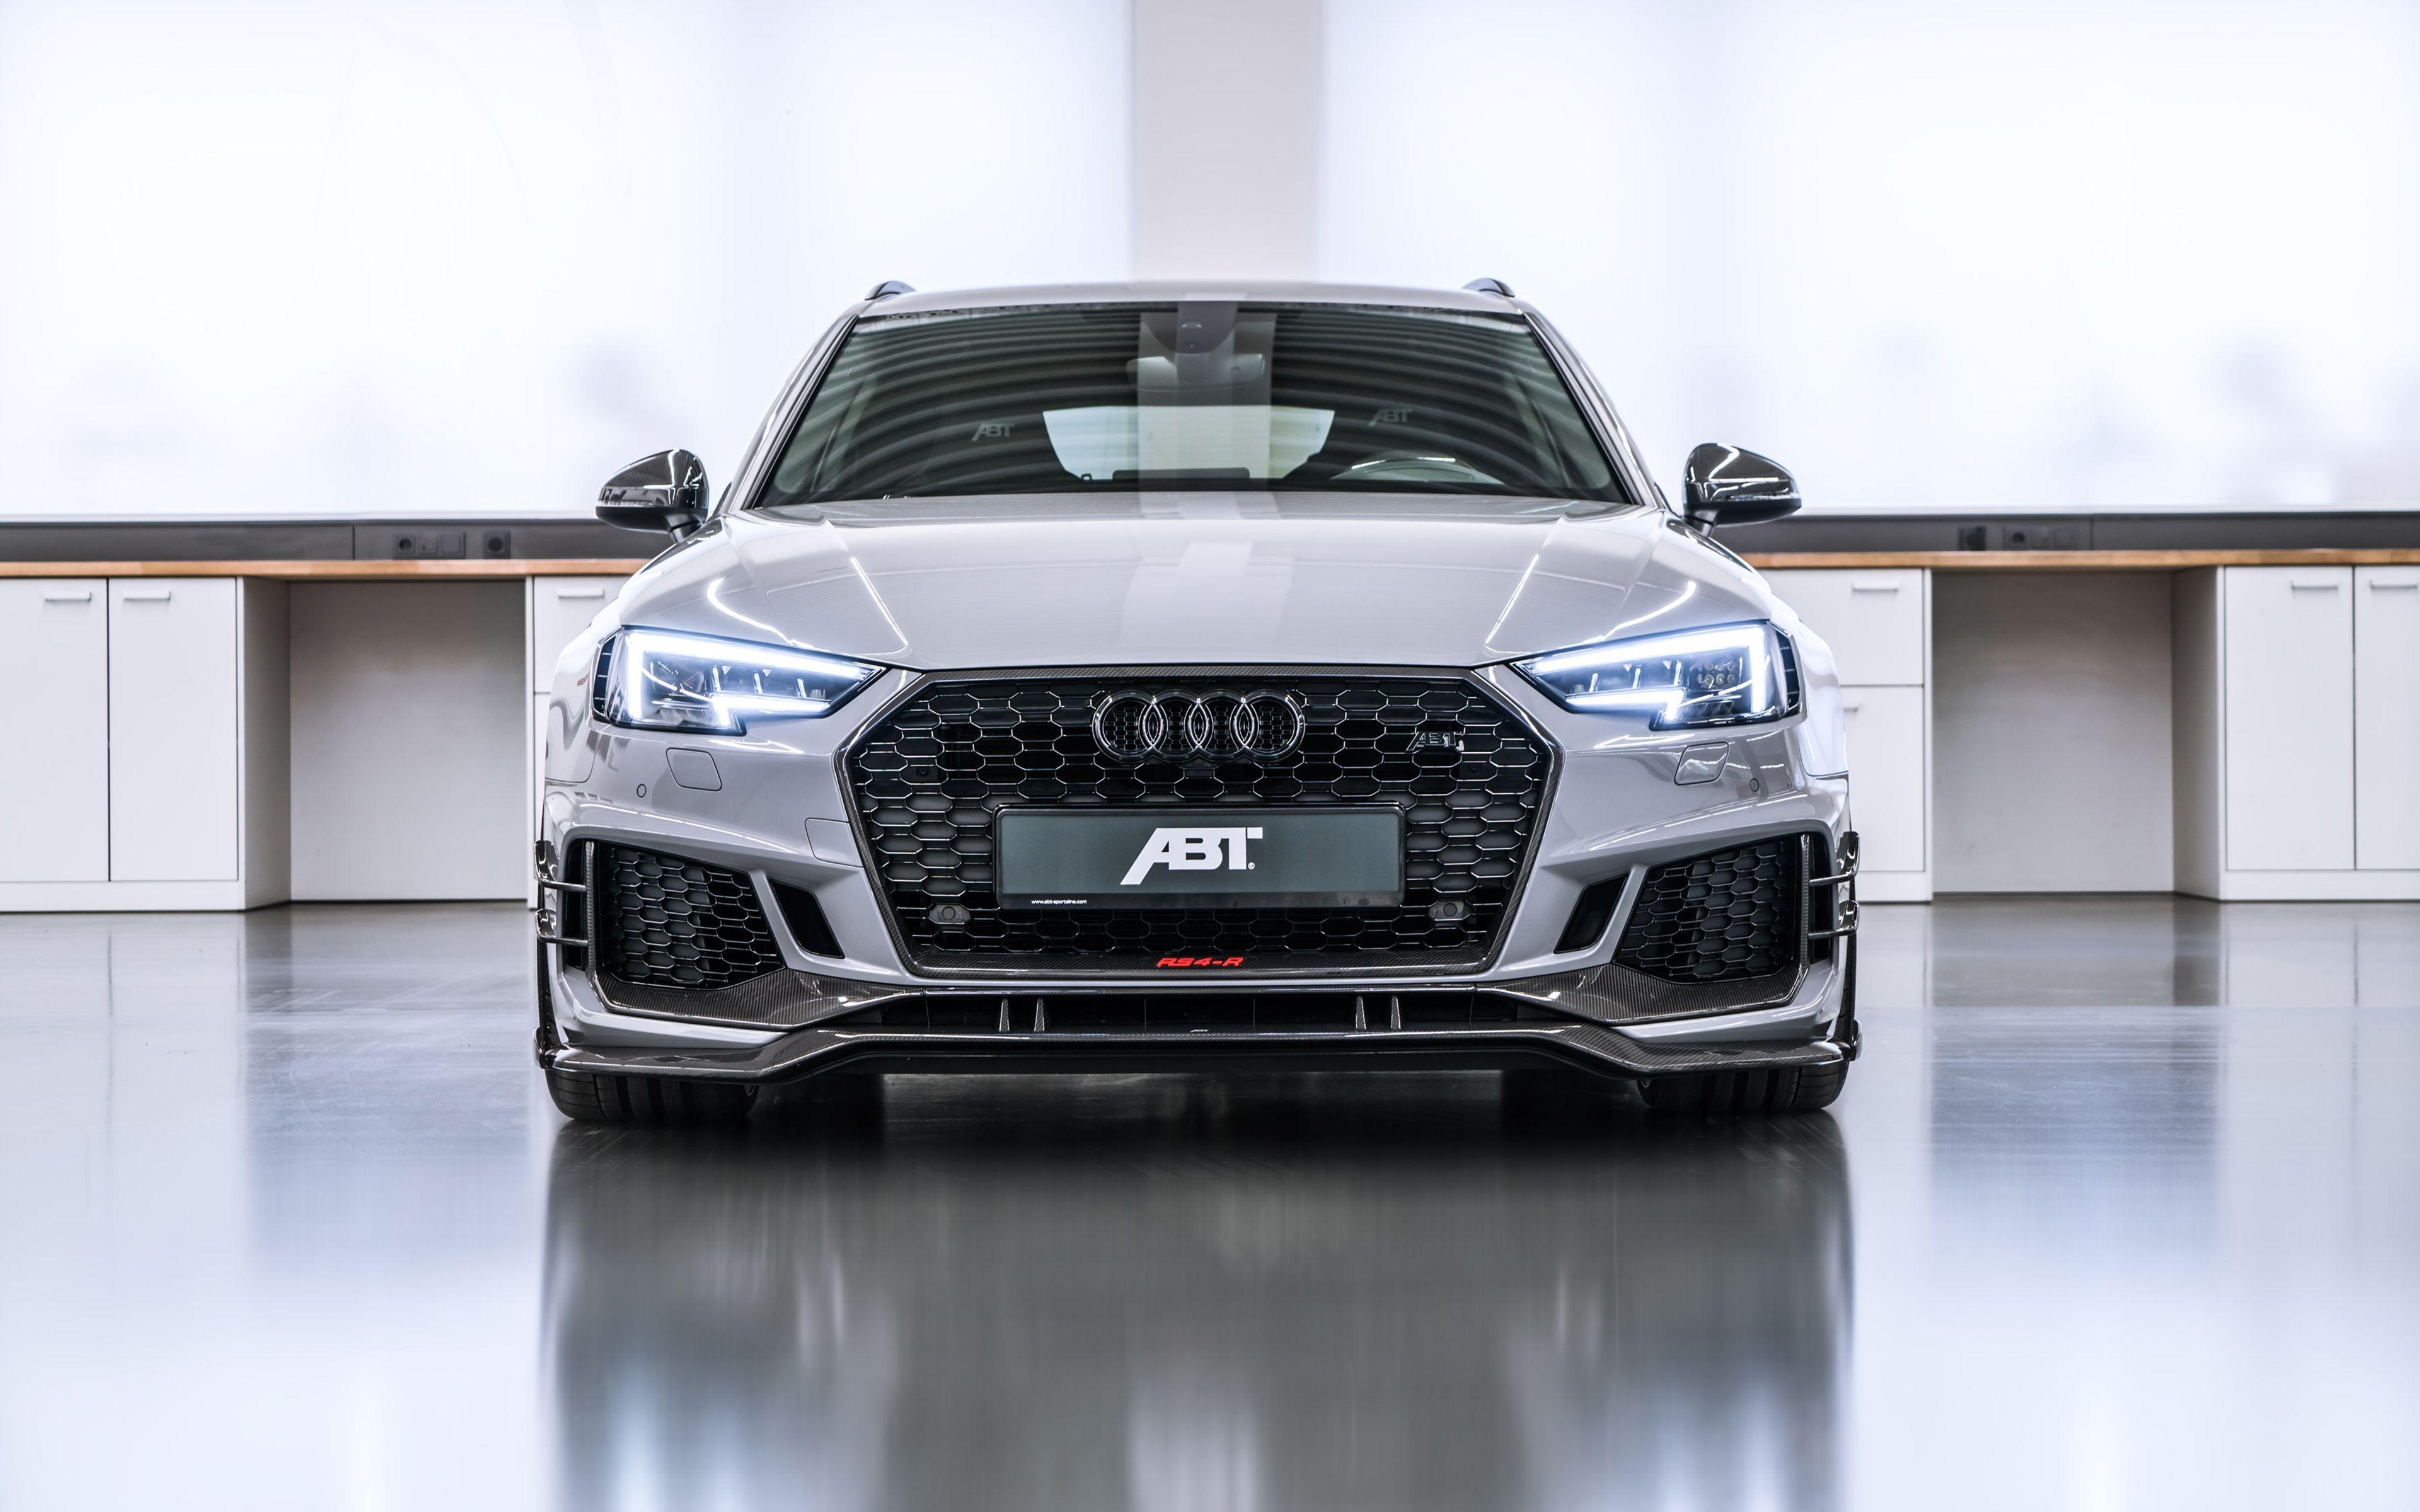 Abt Audi Rs 4 R Avant 2018 4k Rs4 Avant Audi Rs4 Avant Audi Rs6